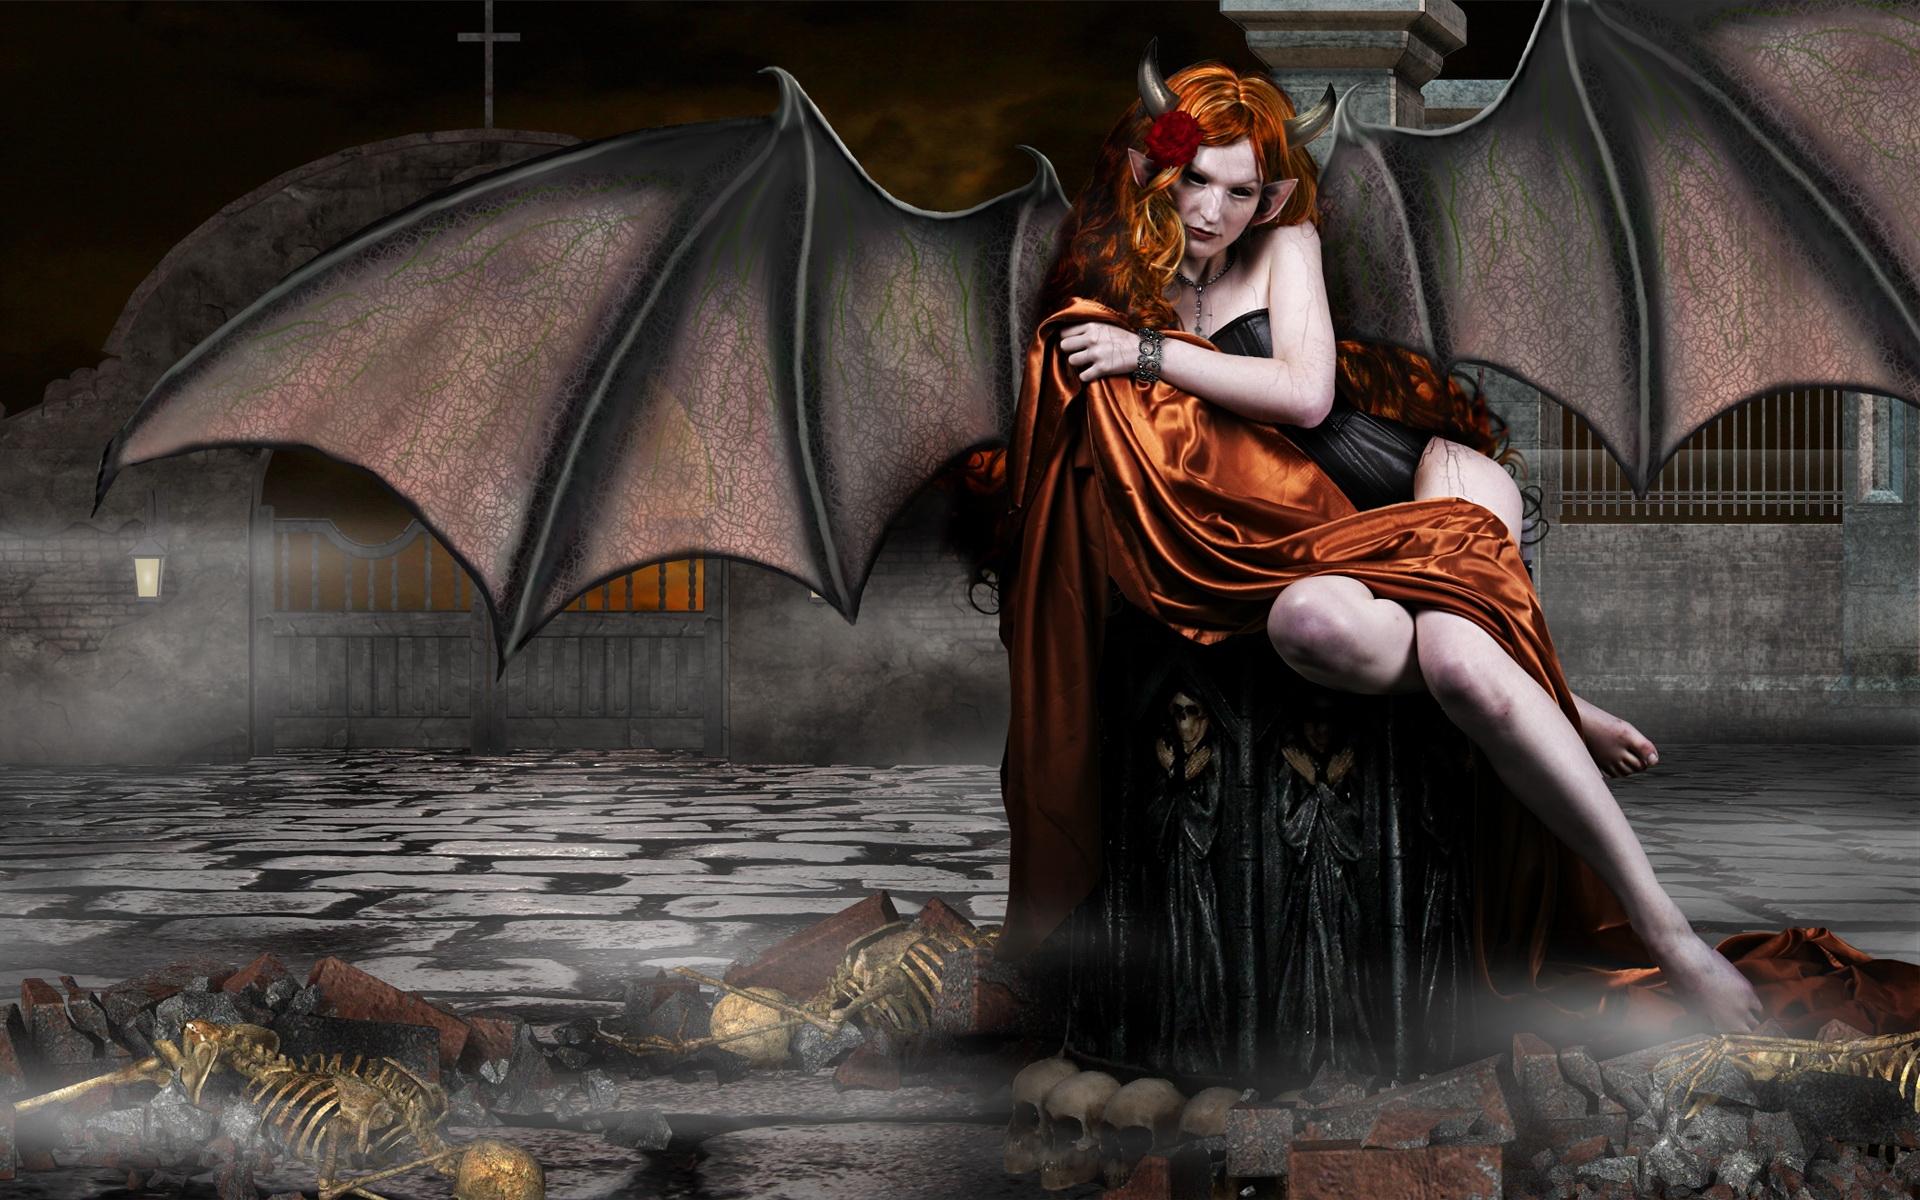 Demonic 3d pics nude video